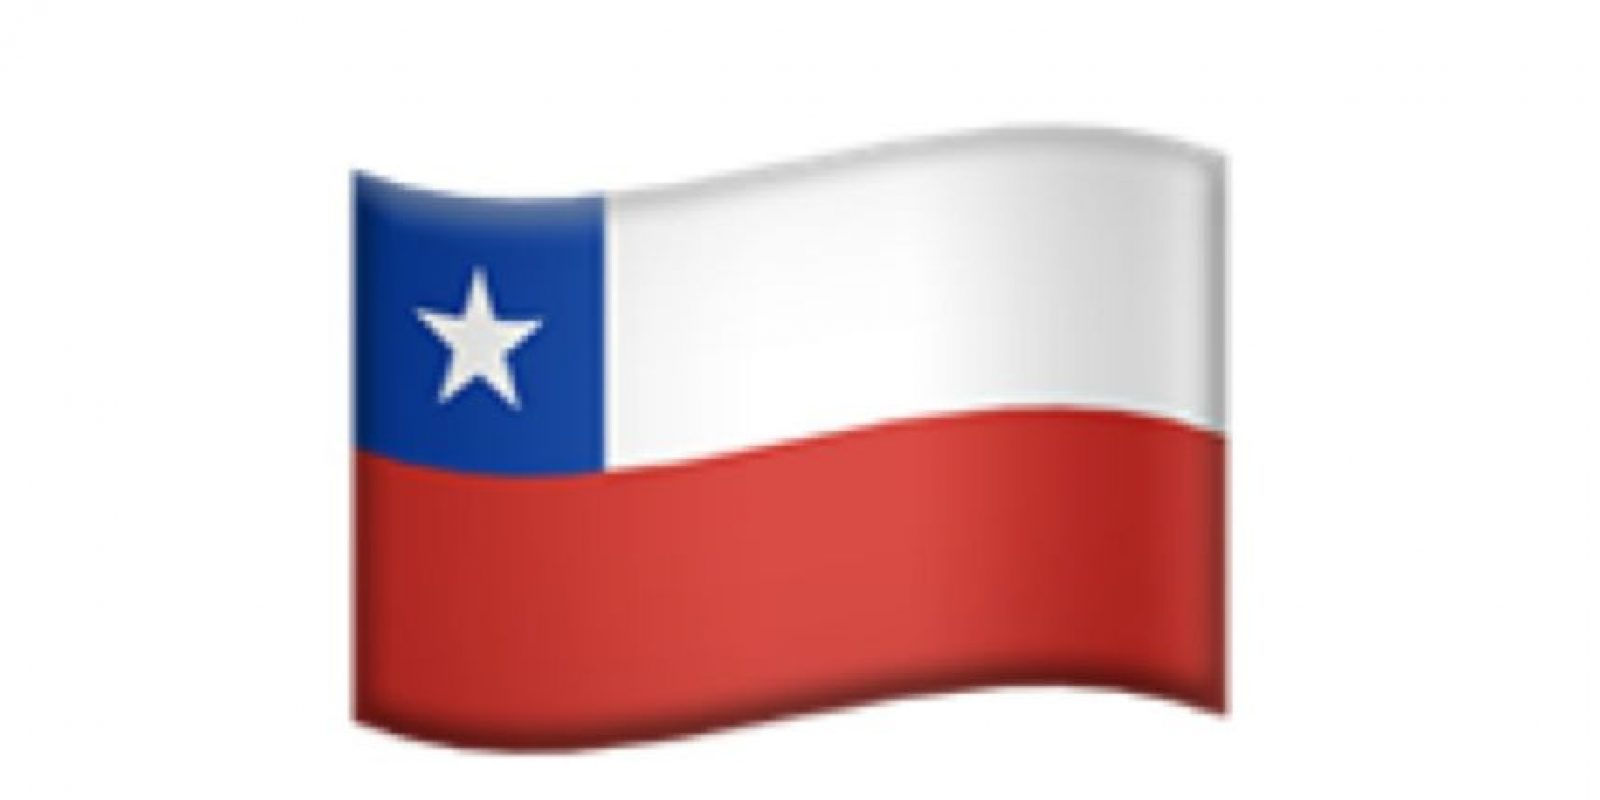 Bandera de Chile. Foto:Apple